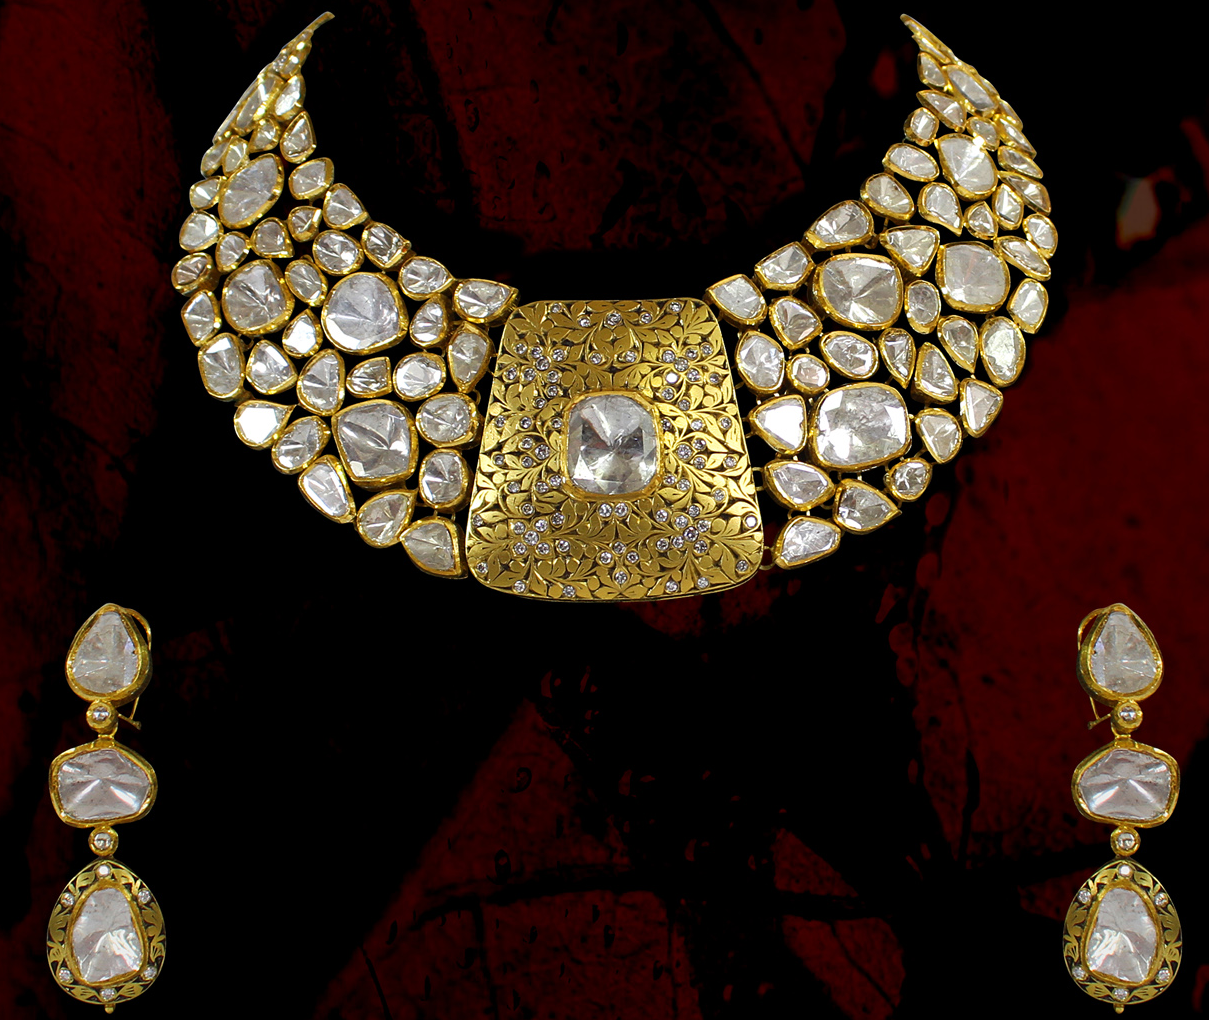 cd7db22471483 Stunning Heavy kundan polki choker neck | Design Ideas | Bollywood ...